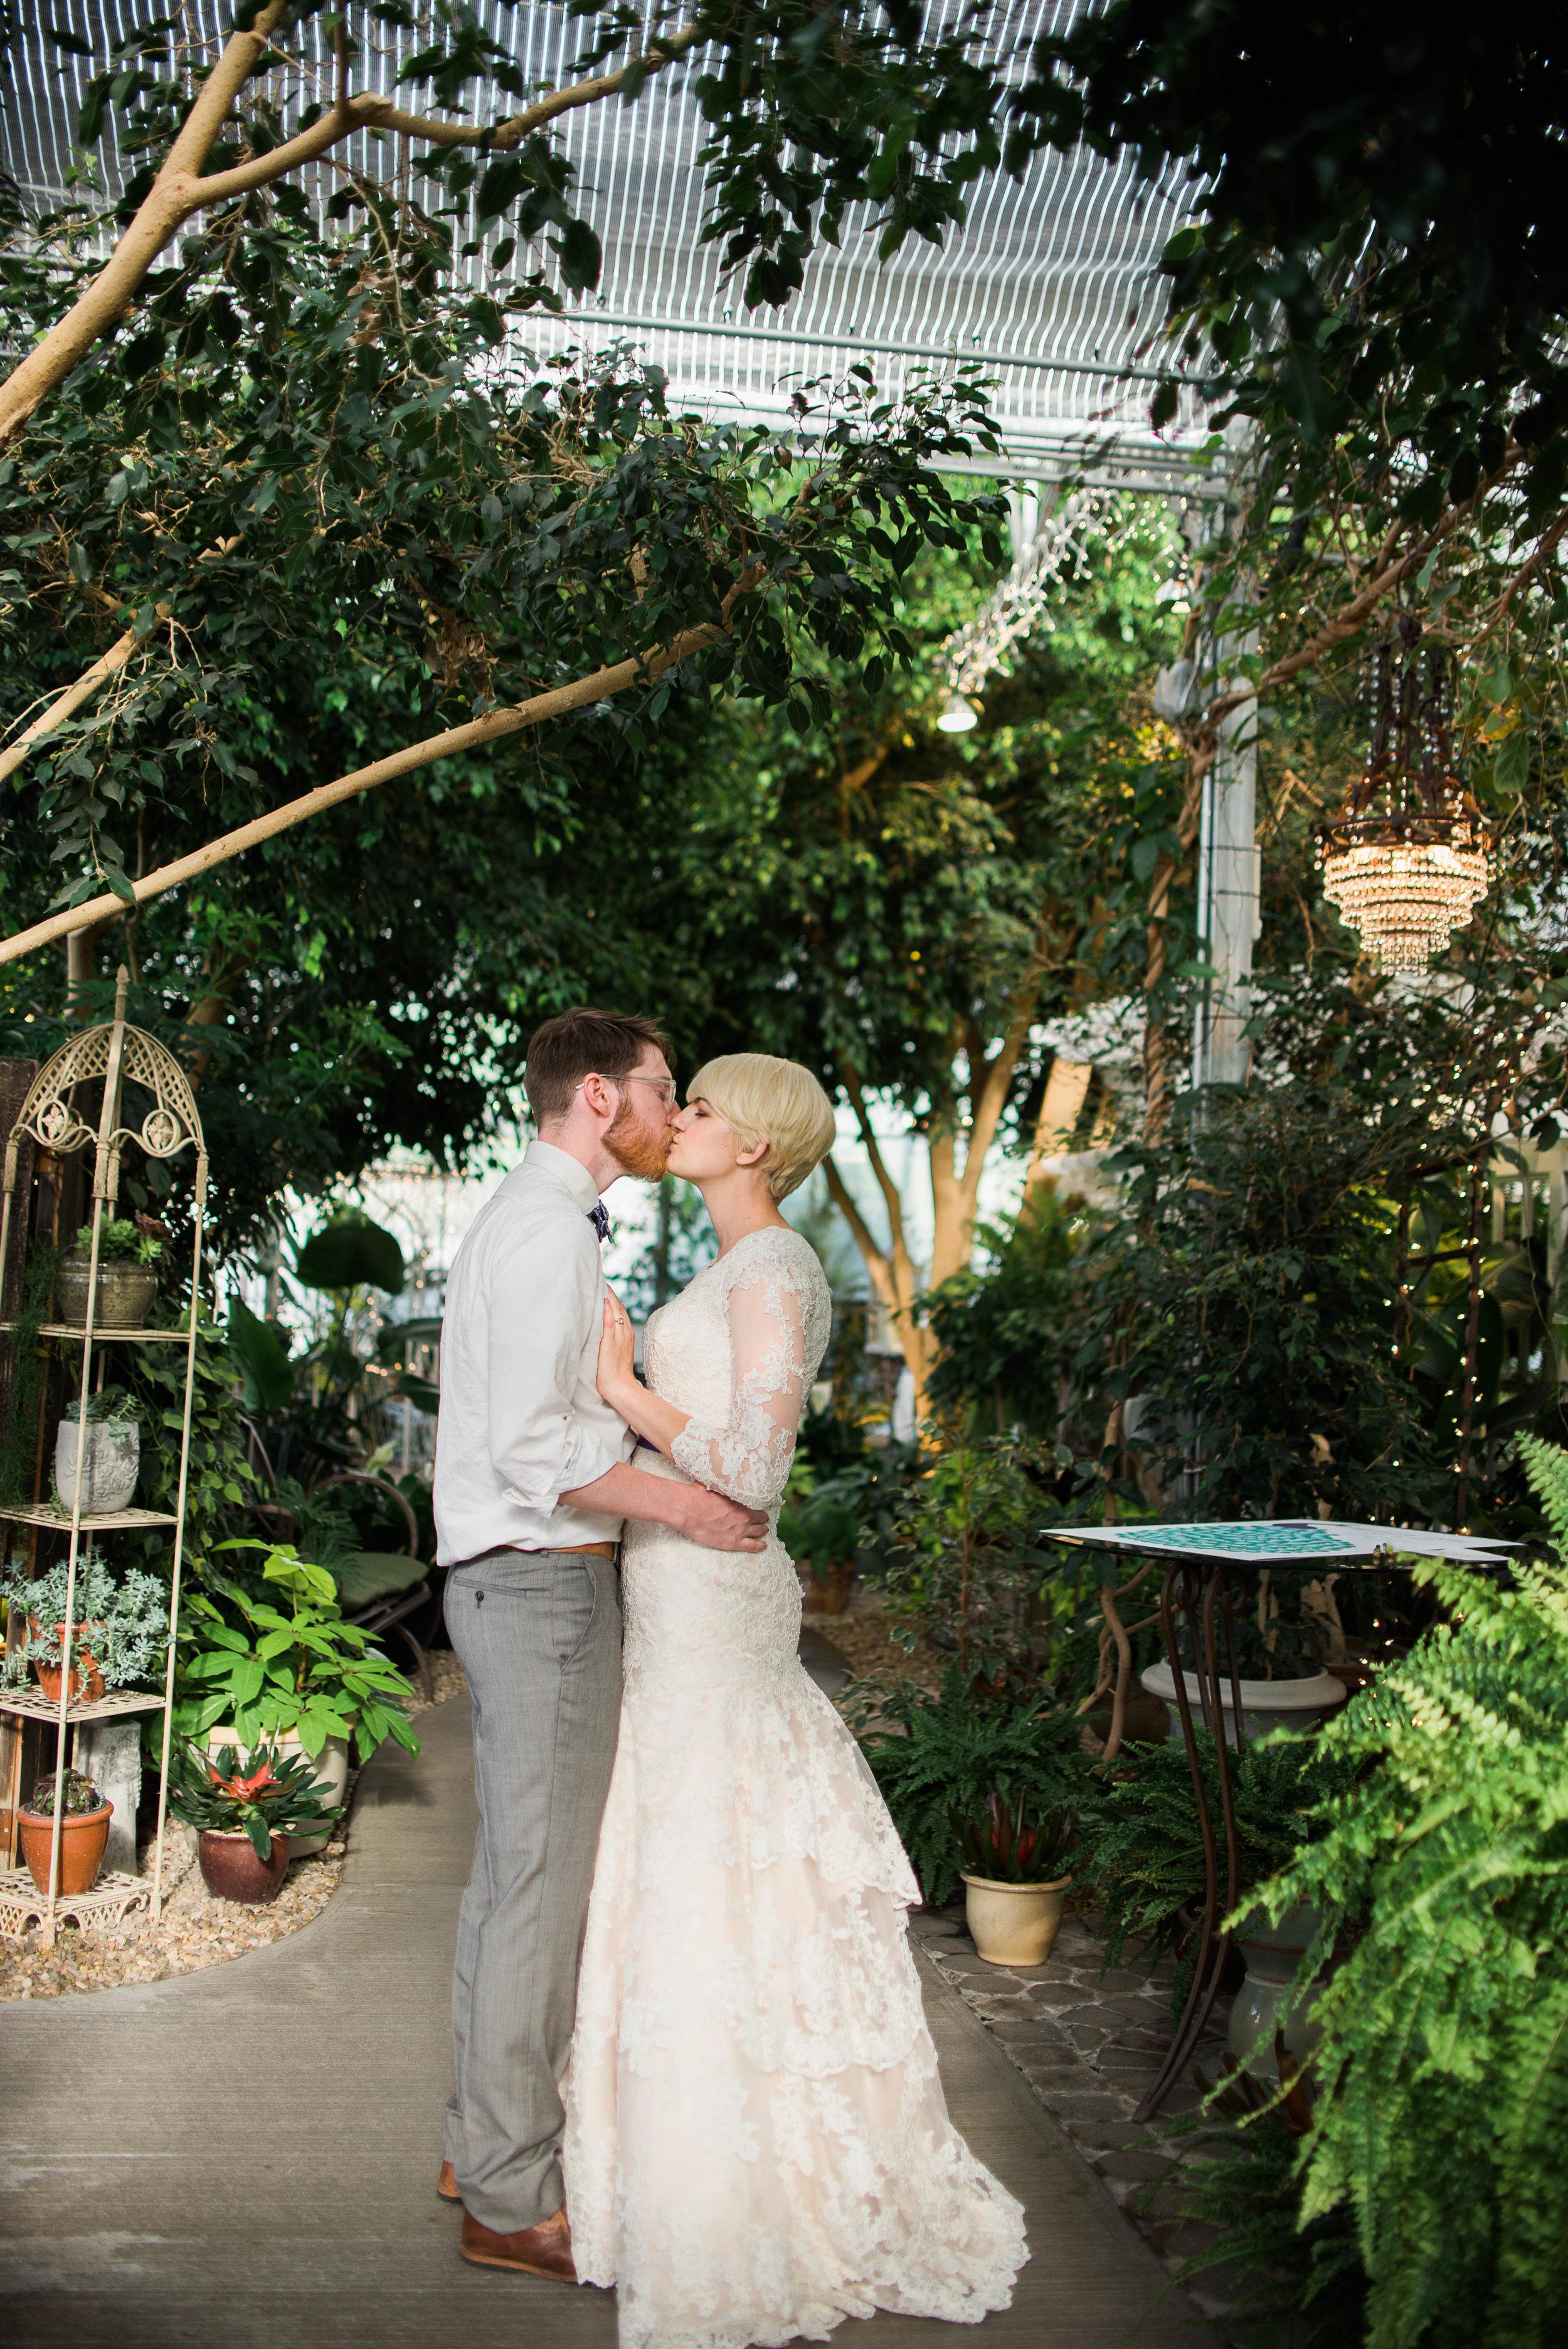 K+M-Wedding-DaySadie_Banks_Photography-901.jpg